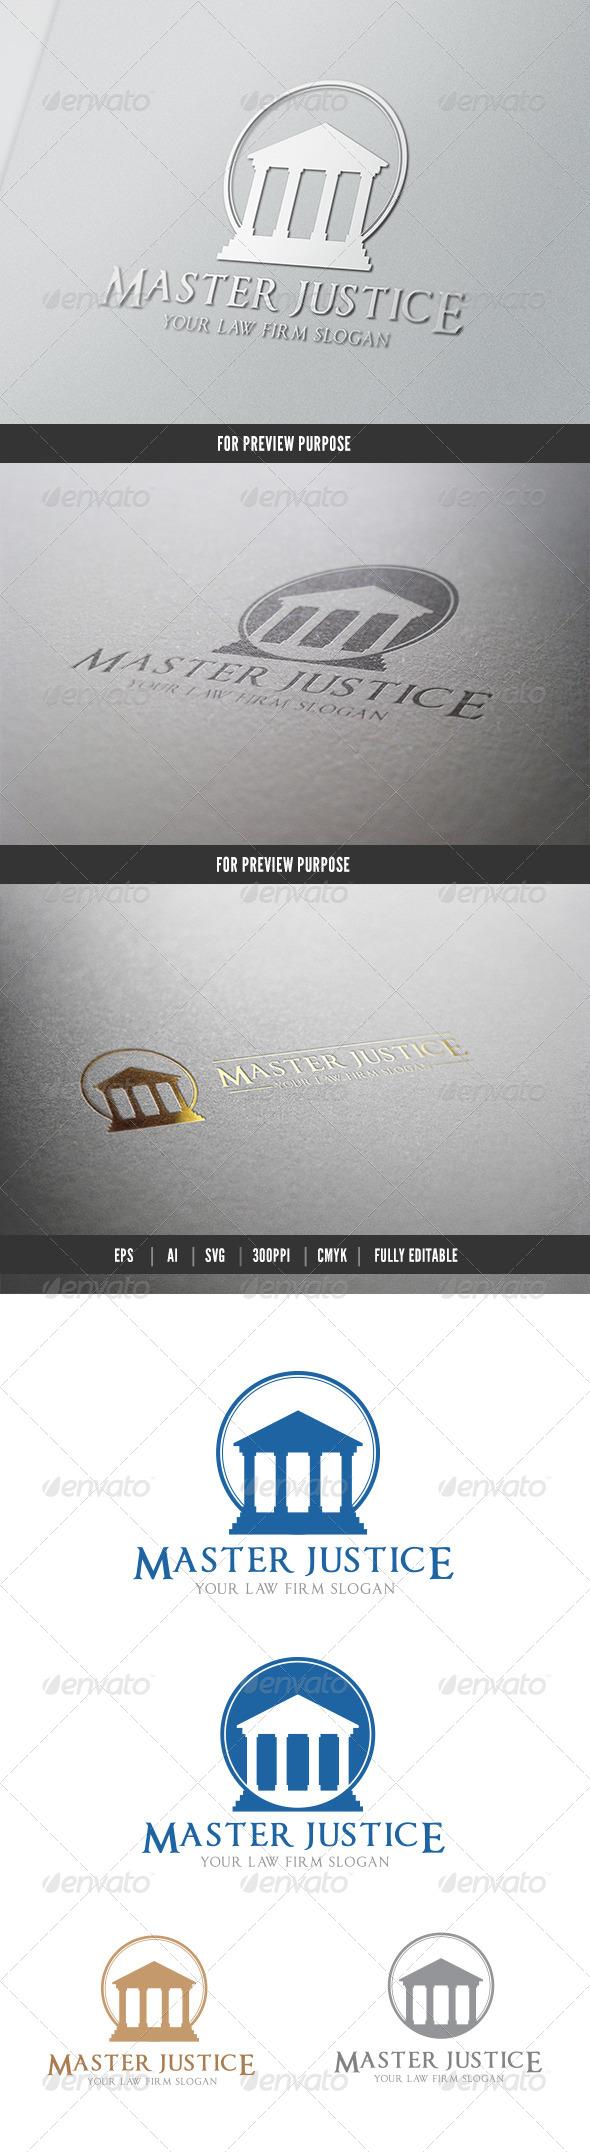 GraphicRiver Master Justice 6088587